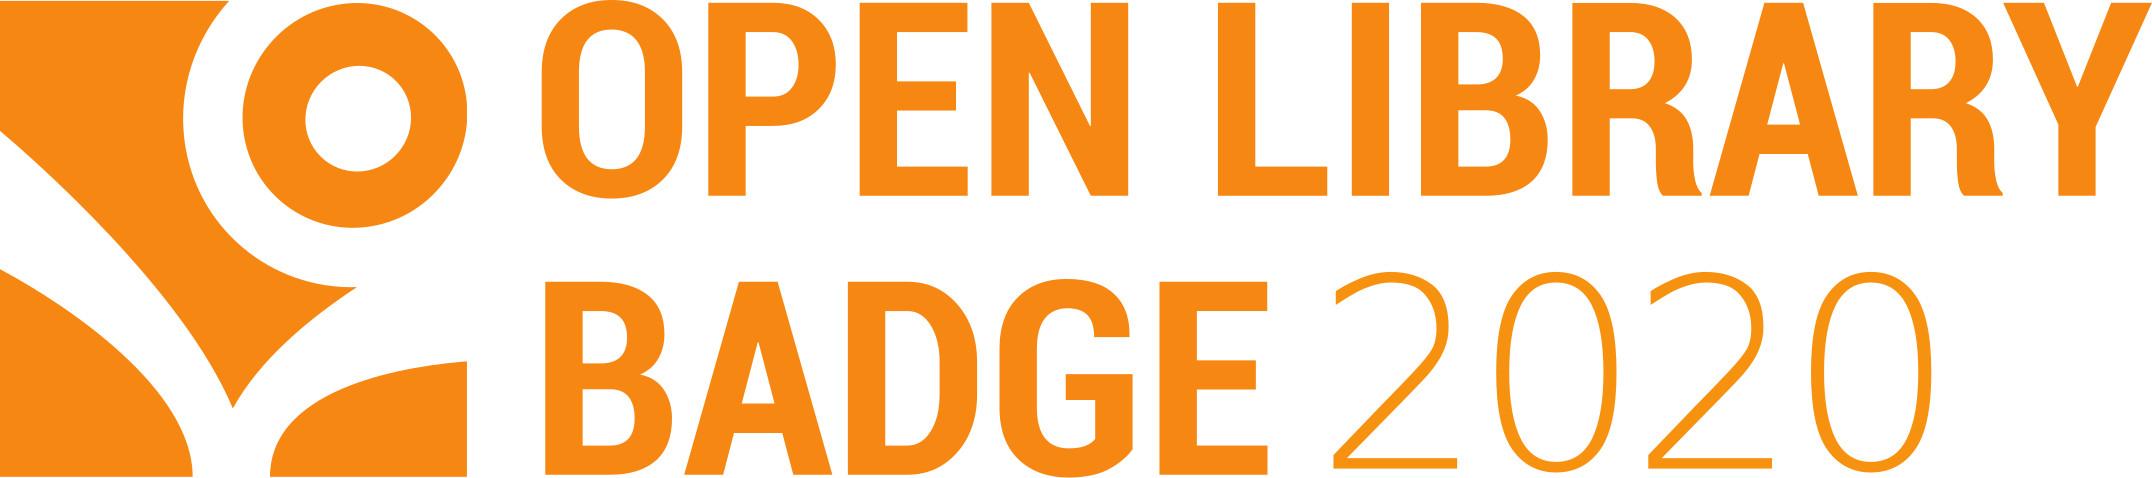 Open Library Batch 2020